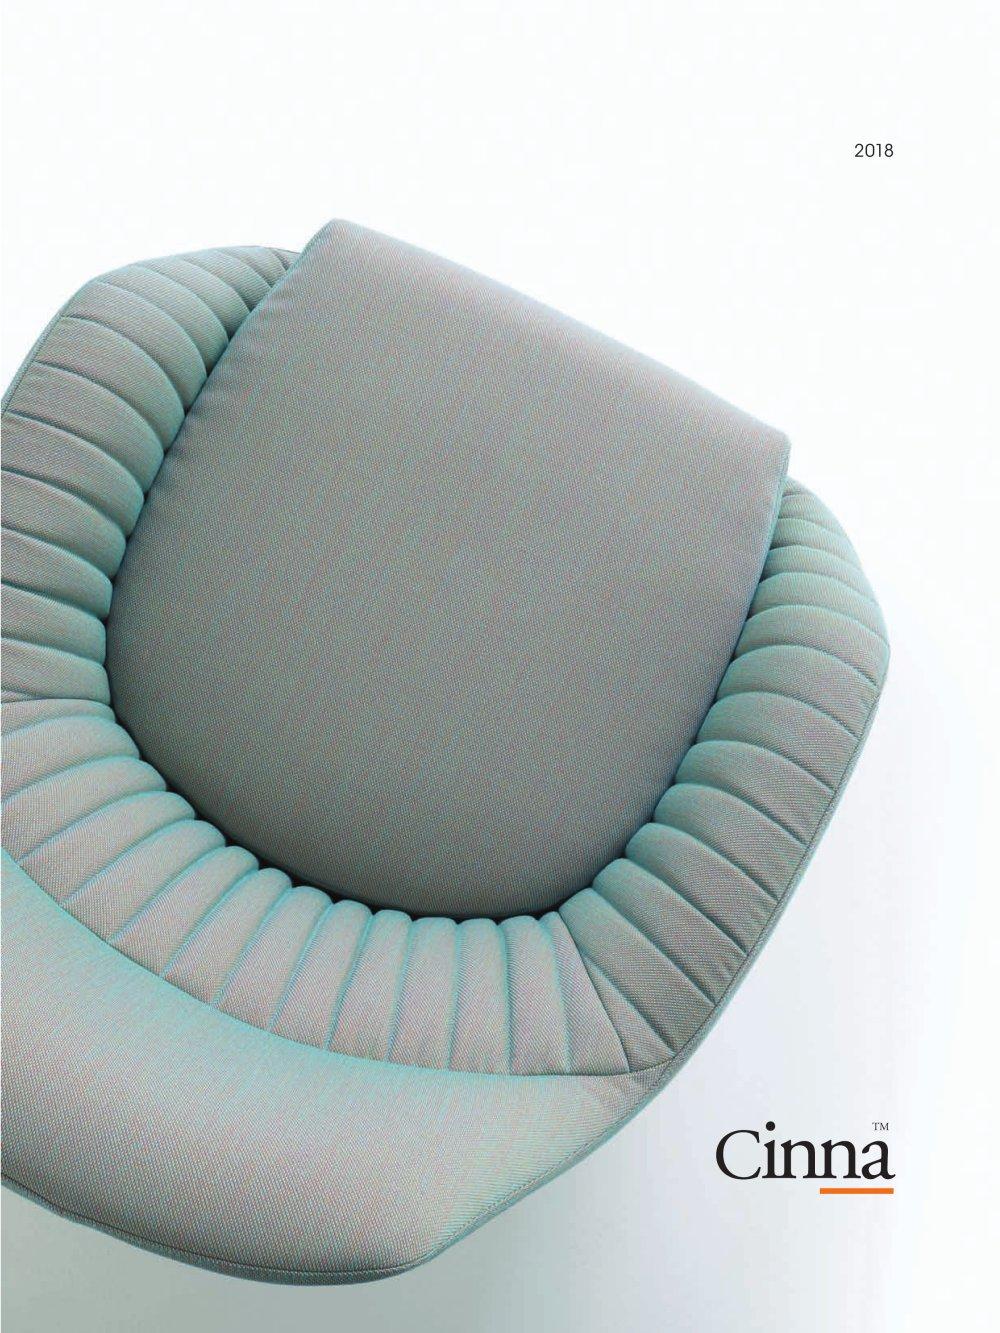 CINNA Catalogue CINNA Catalogue PDF Documentation Brochure - Canape cinna cuir